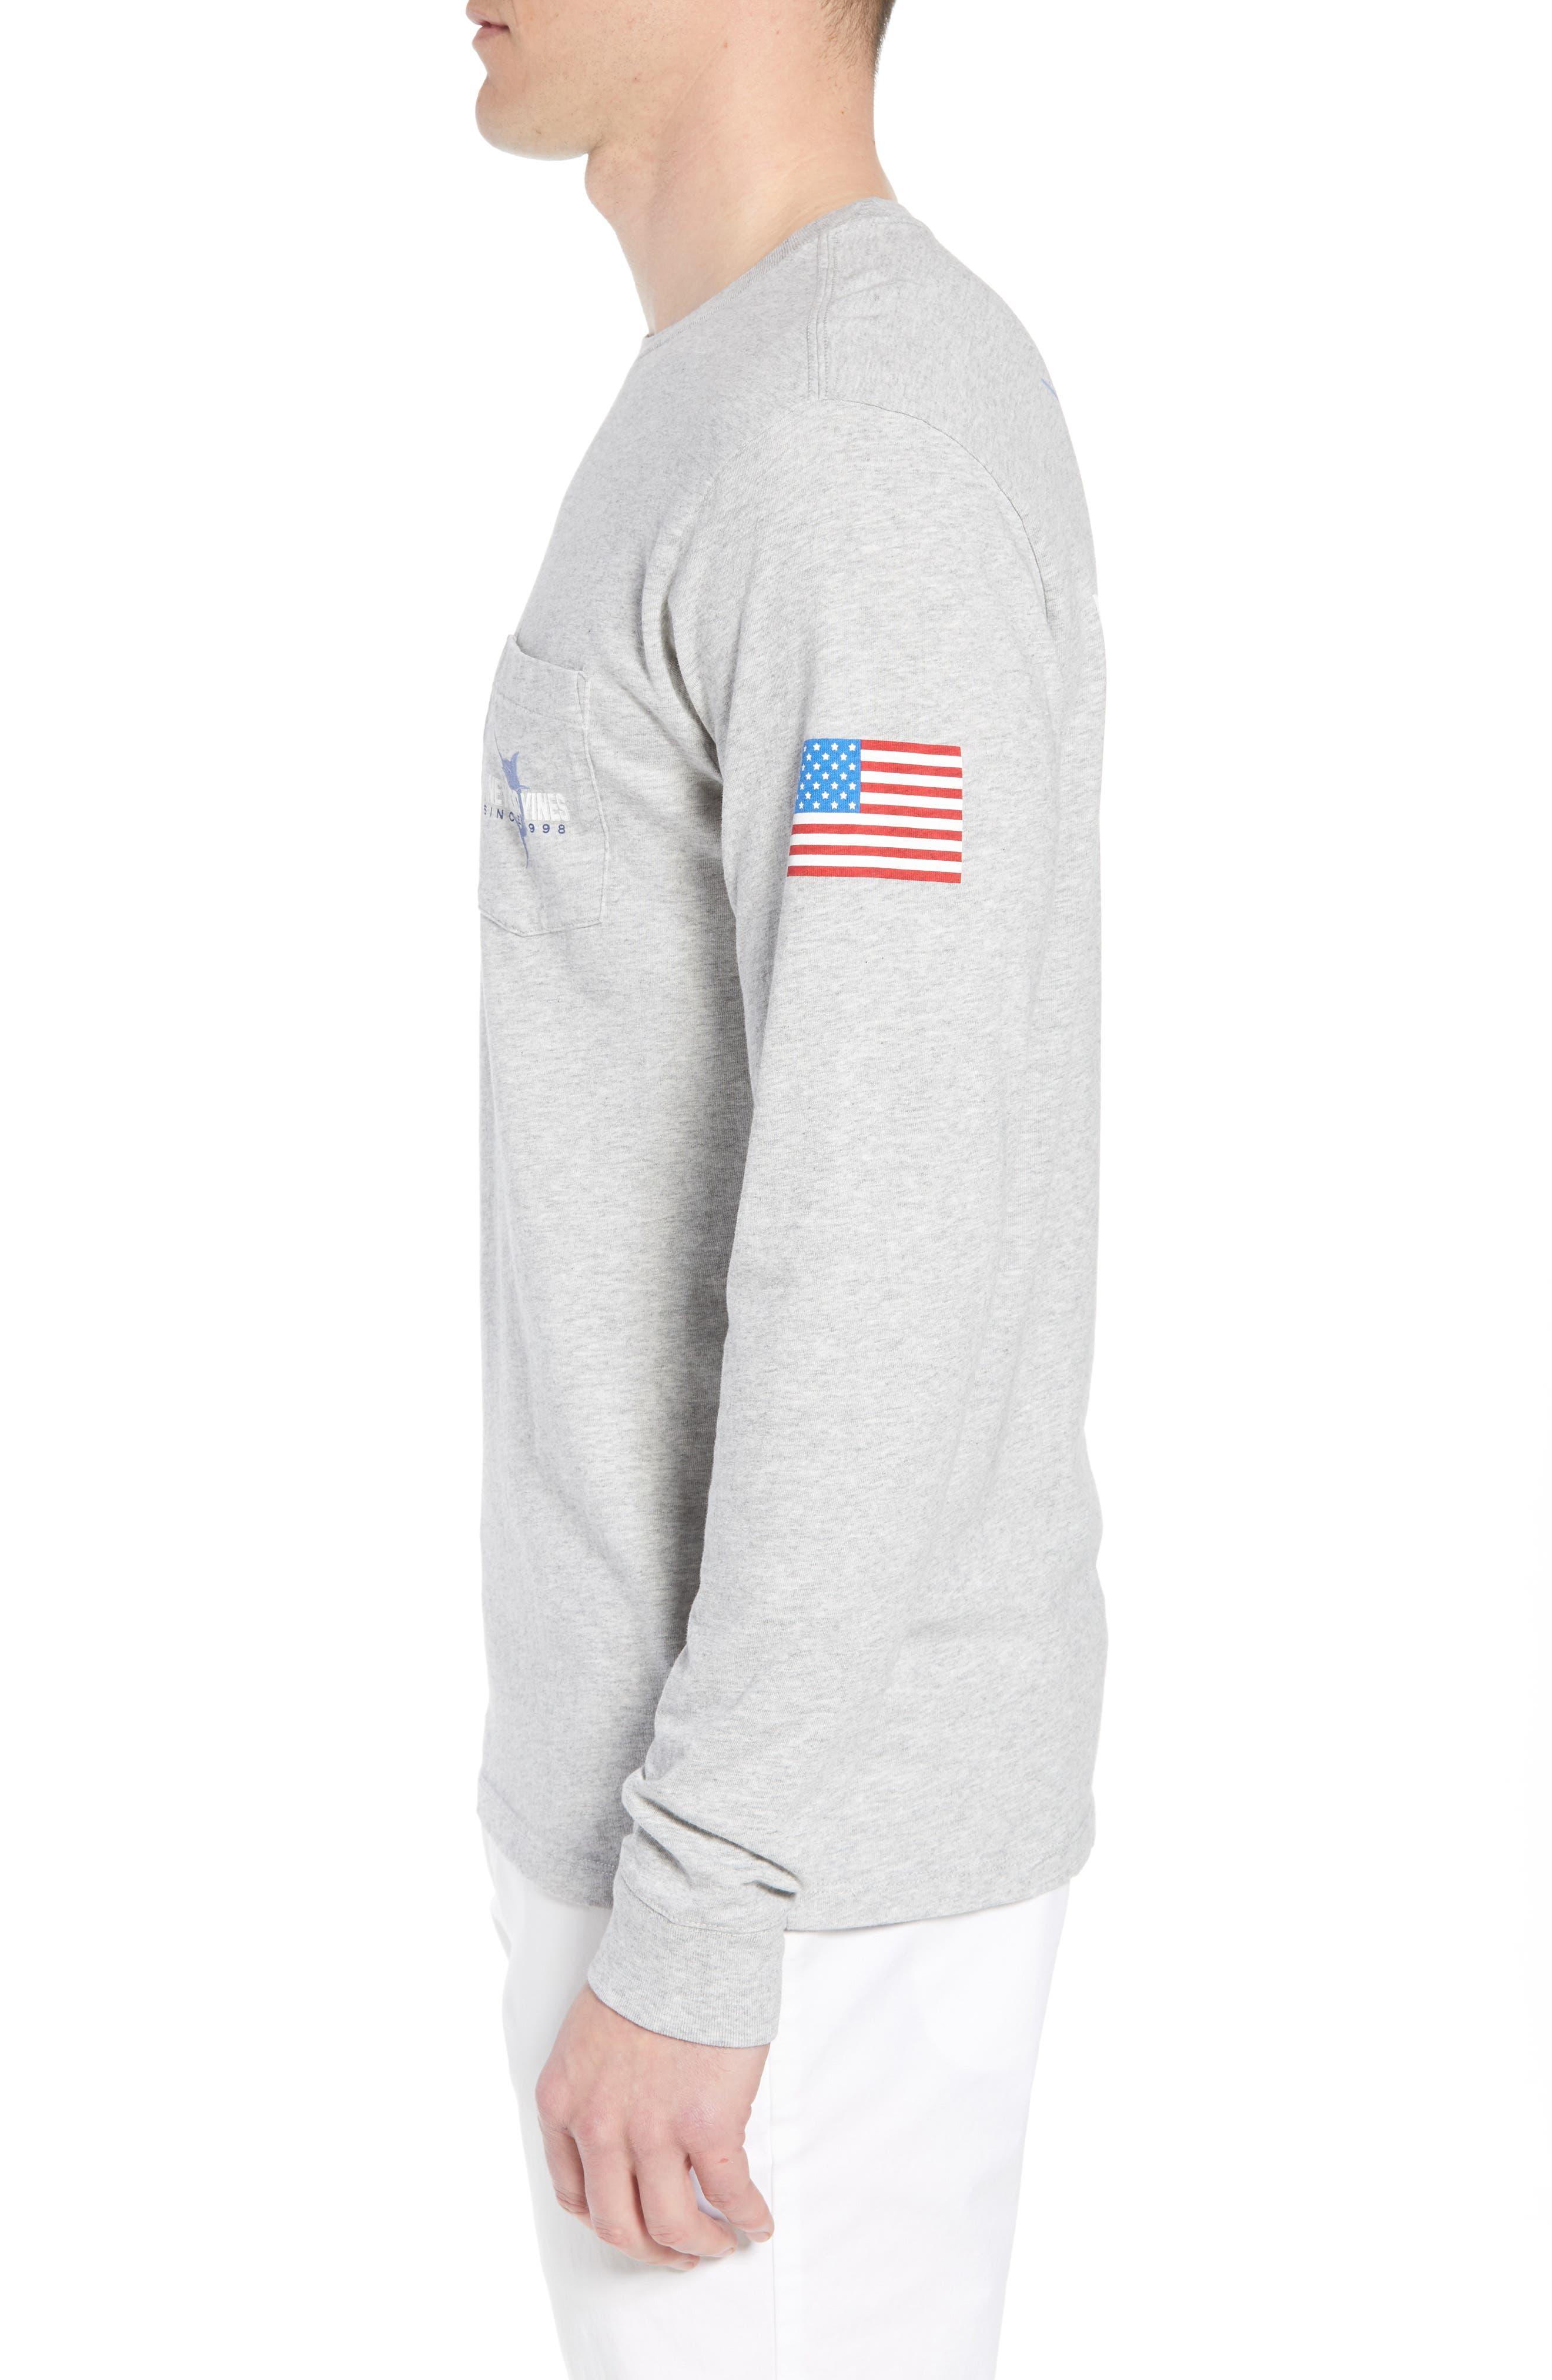 Marlin 98 Long Sleeve Pocket T-Shirt,                             Alternate thumbnail 3, color,                             039